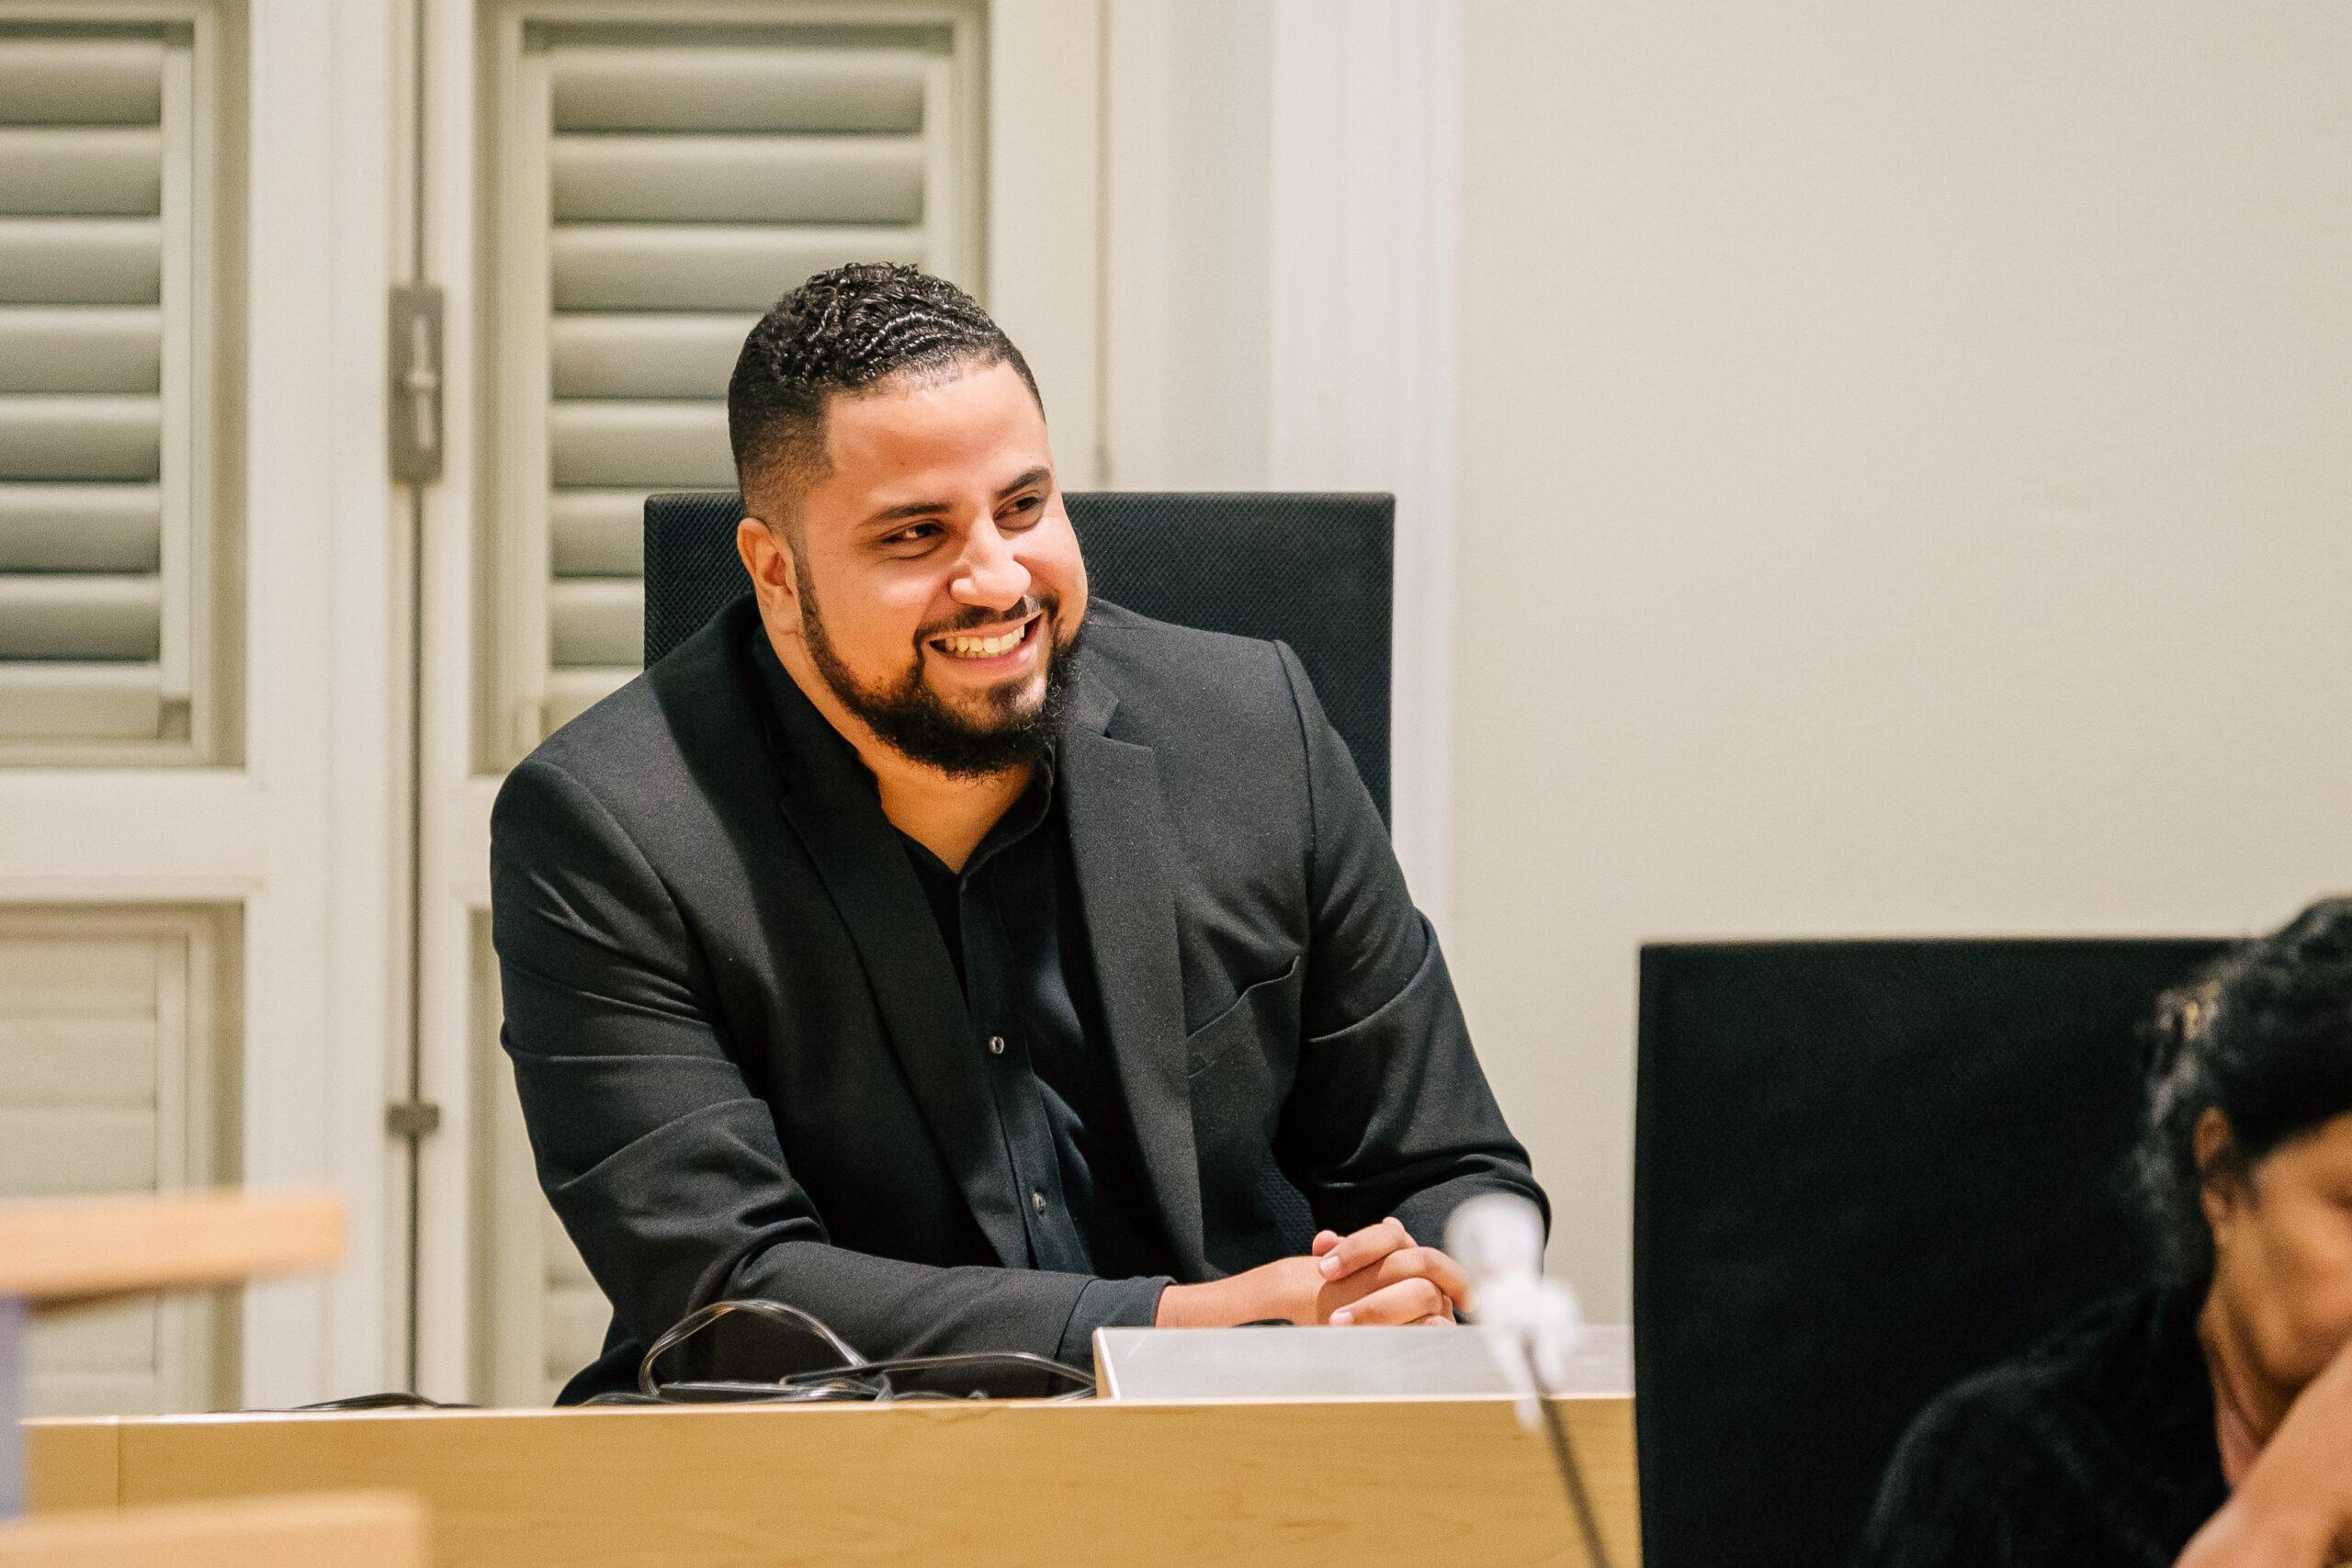 DIPUTADO THIELMAN: PREOKUPASHON TOKANTE KAPASIDAT DI PRODUKSHON DI WEB